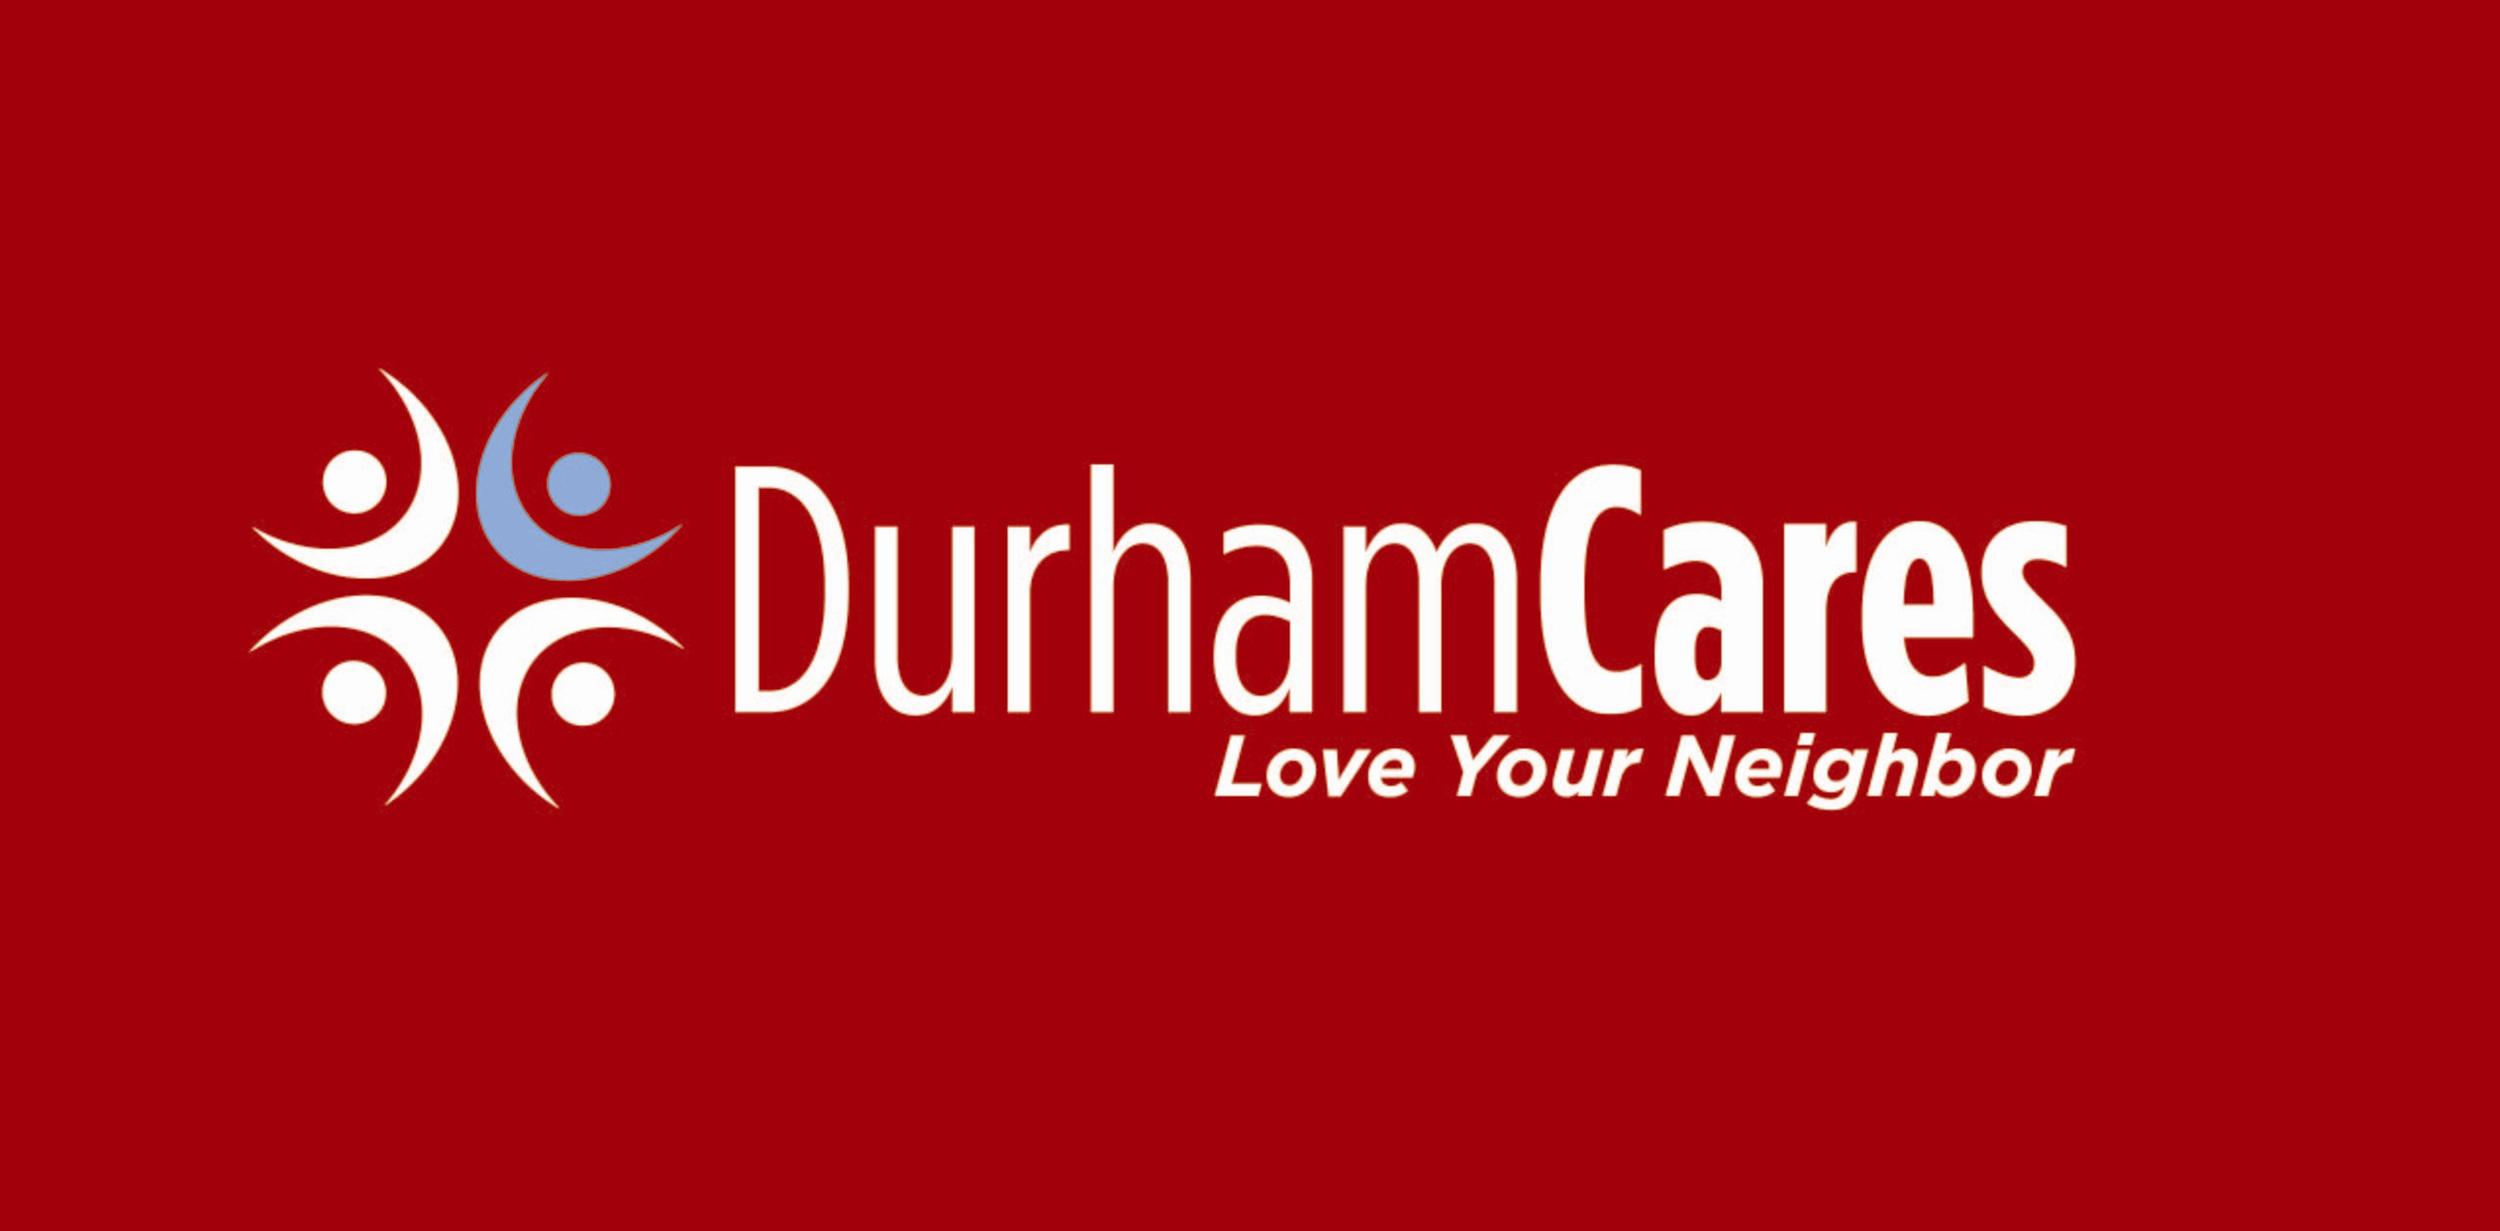 Durham_Cares_logo_red.jpg